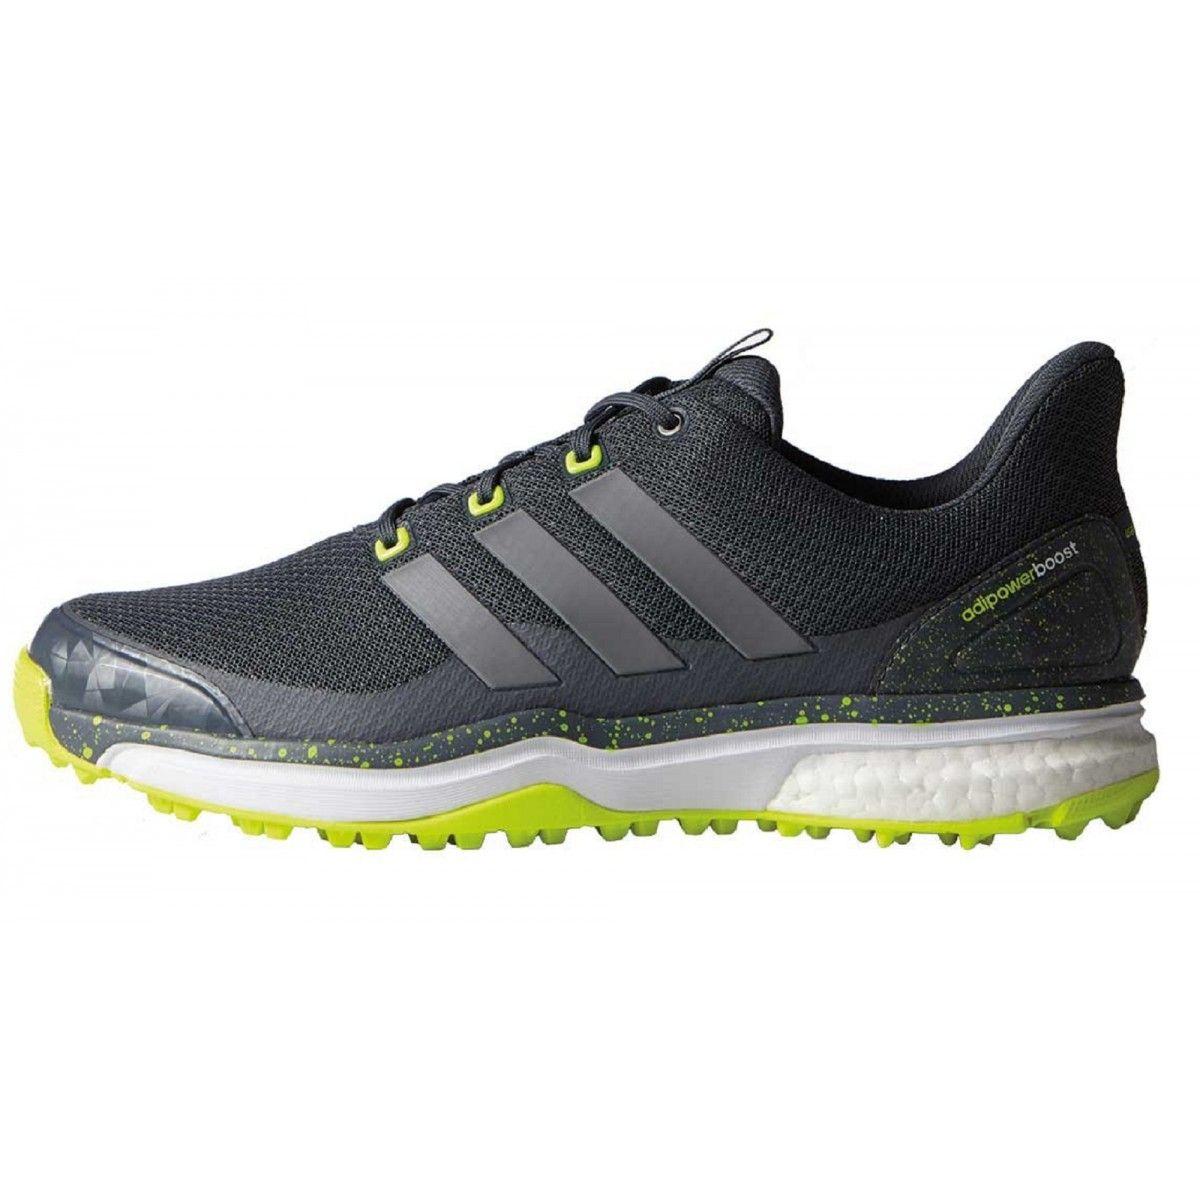 Adidas Adipower Sport Boost 2 F33218 Grey/Yellow Men's